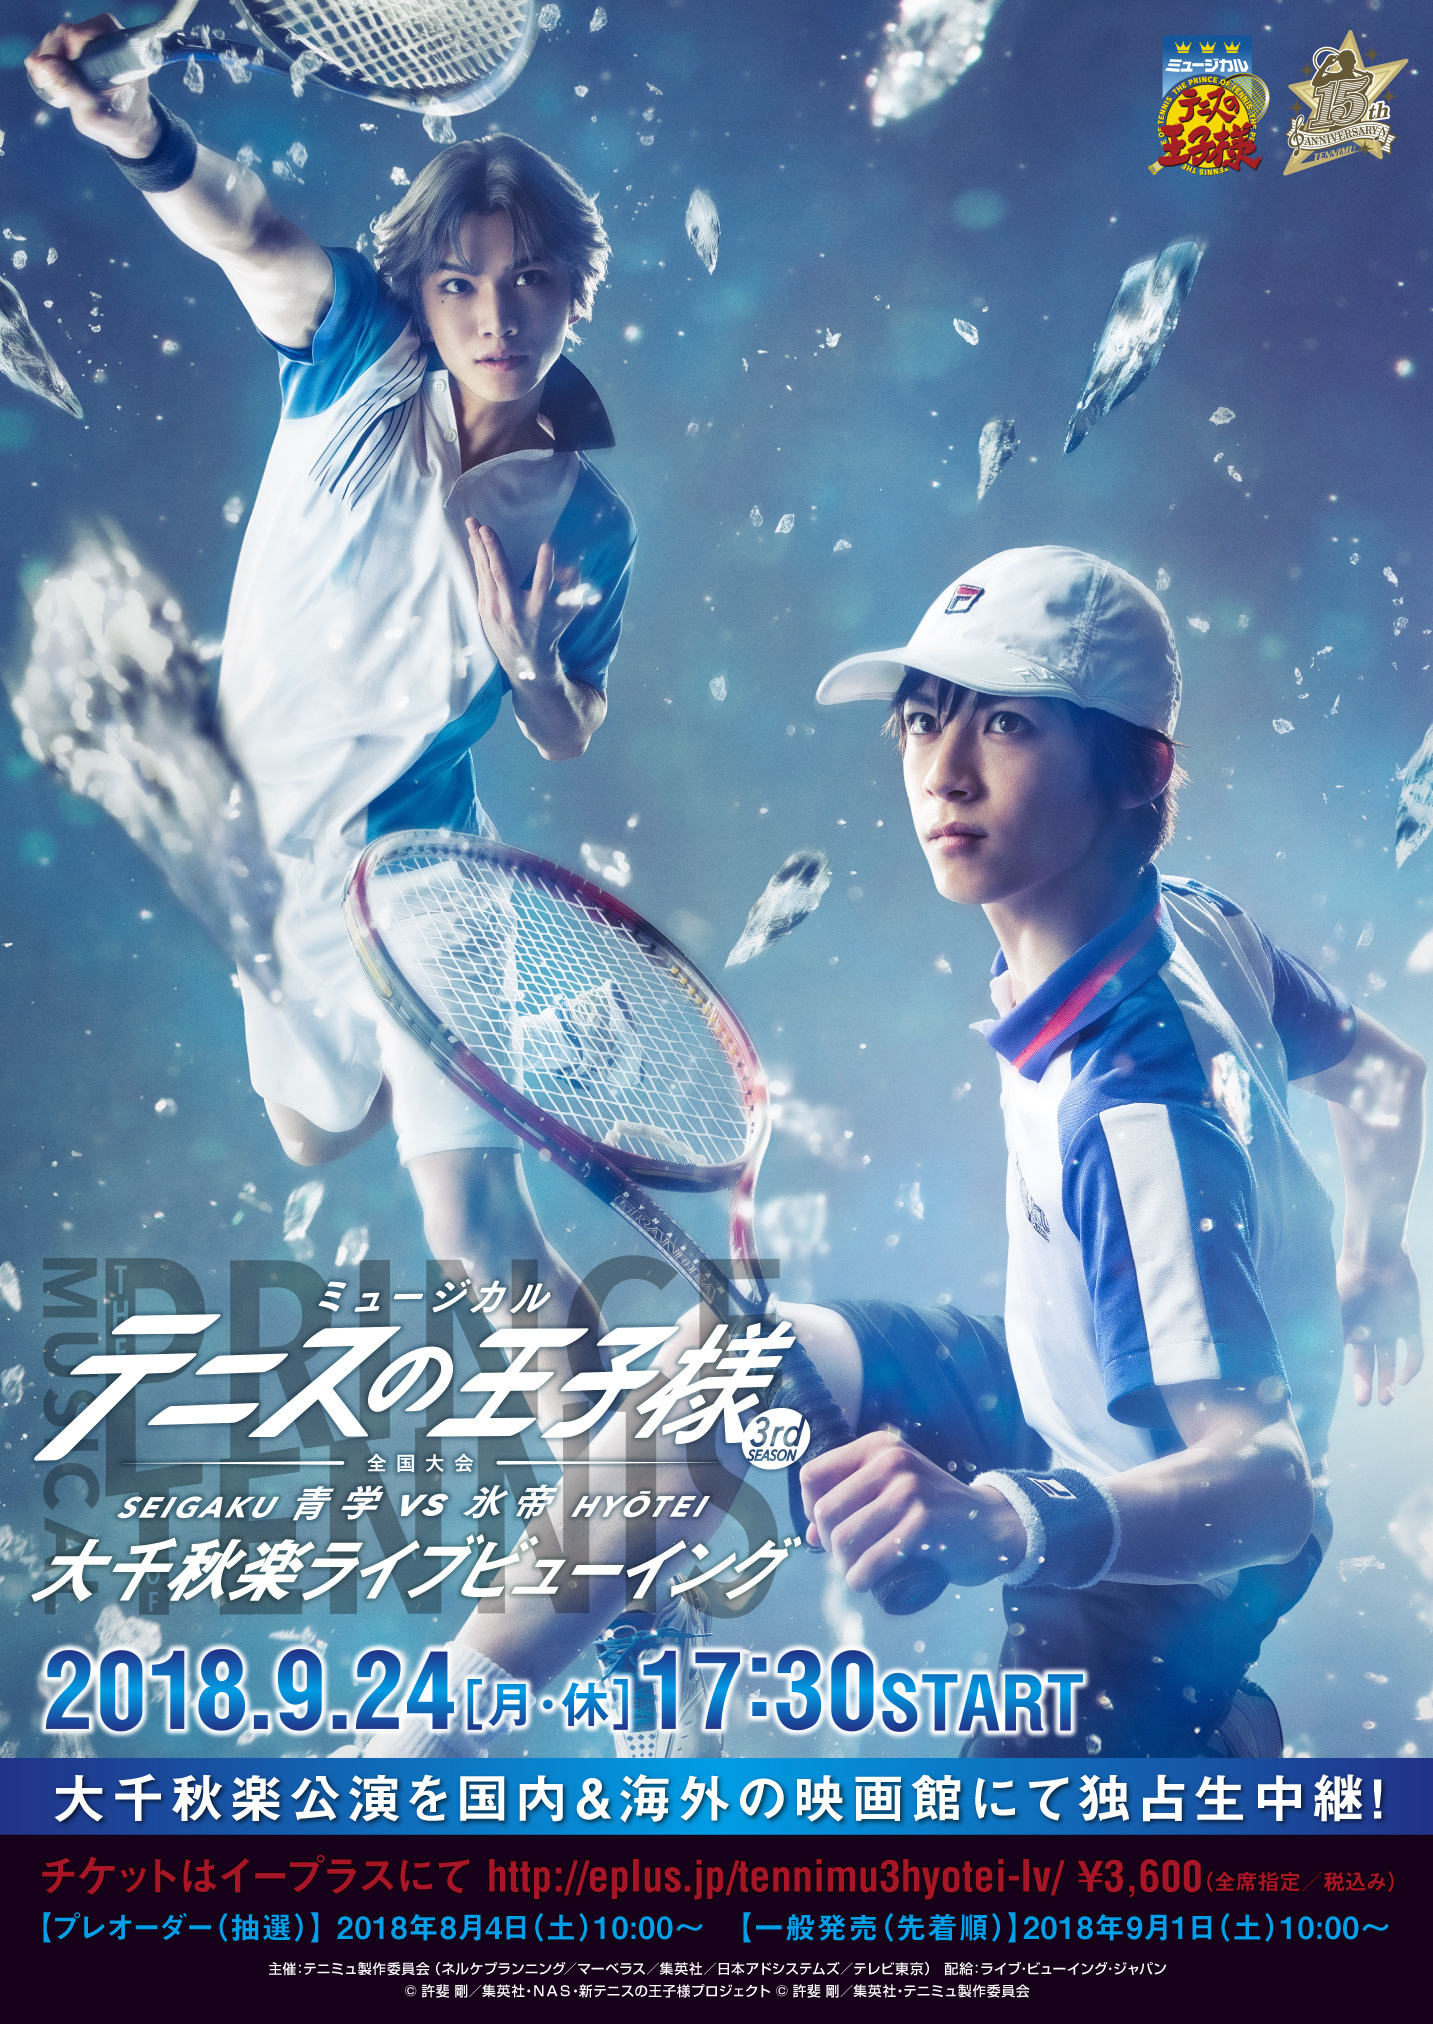 (C)許斐 剛/集英社・NAS・新テニスの王子様プロジェクト ©許斐 剛/集英社・テニミュ製作委員会